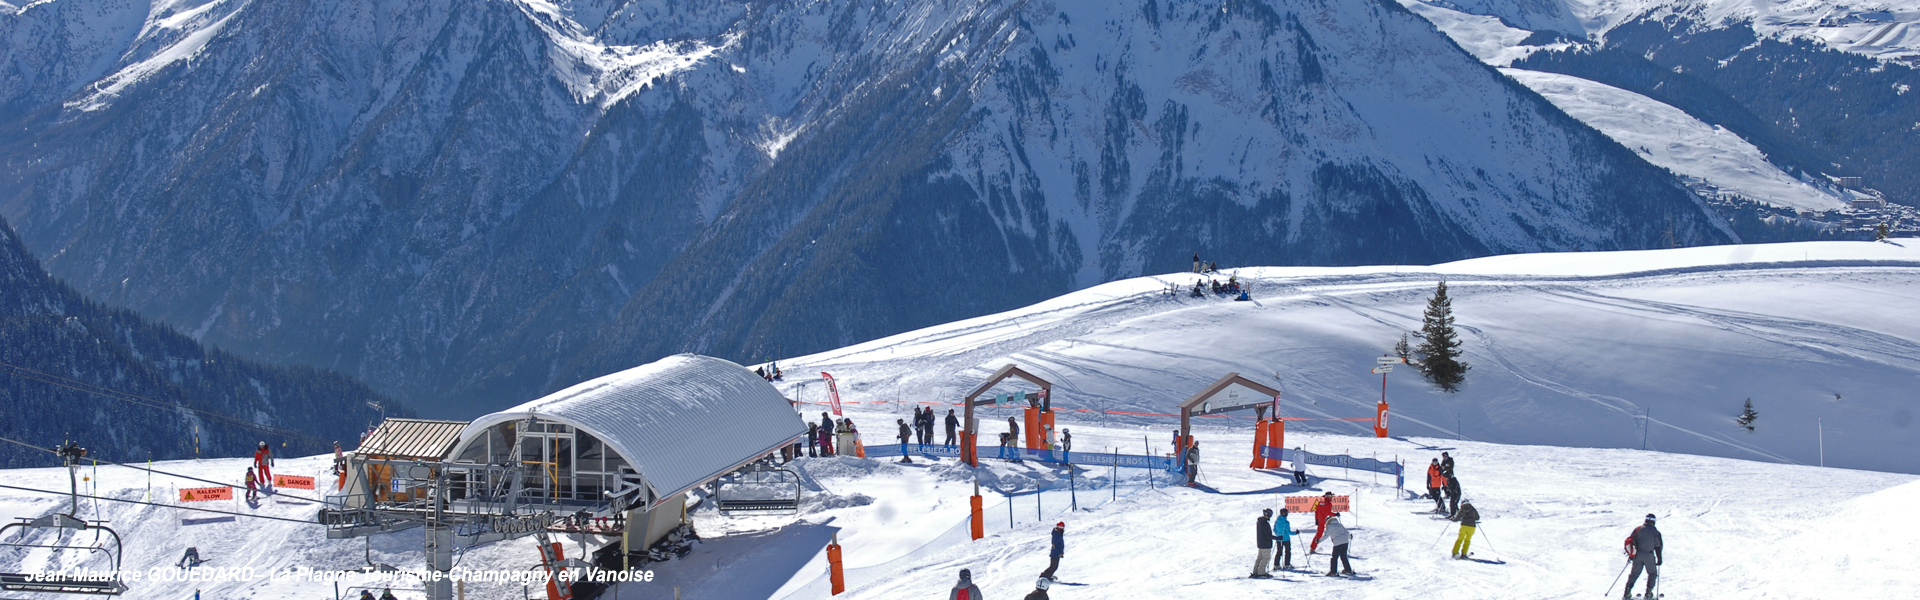 Champagny en Vanoise Ski Champagny en Vanoise Station